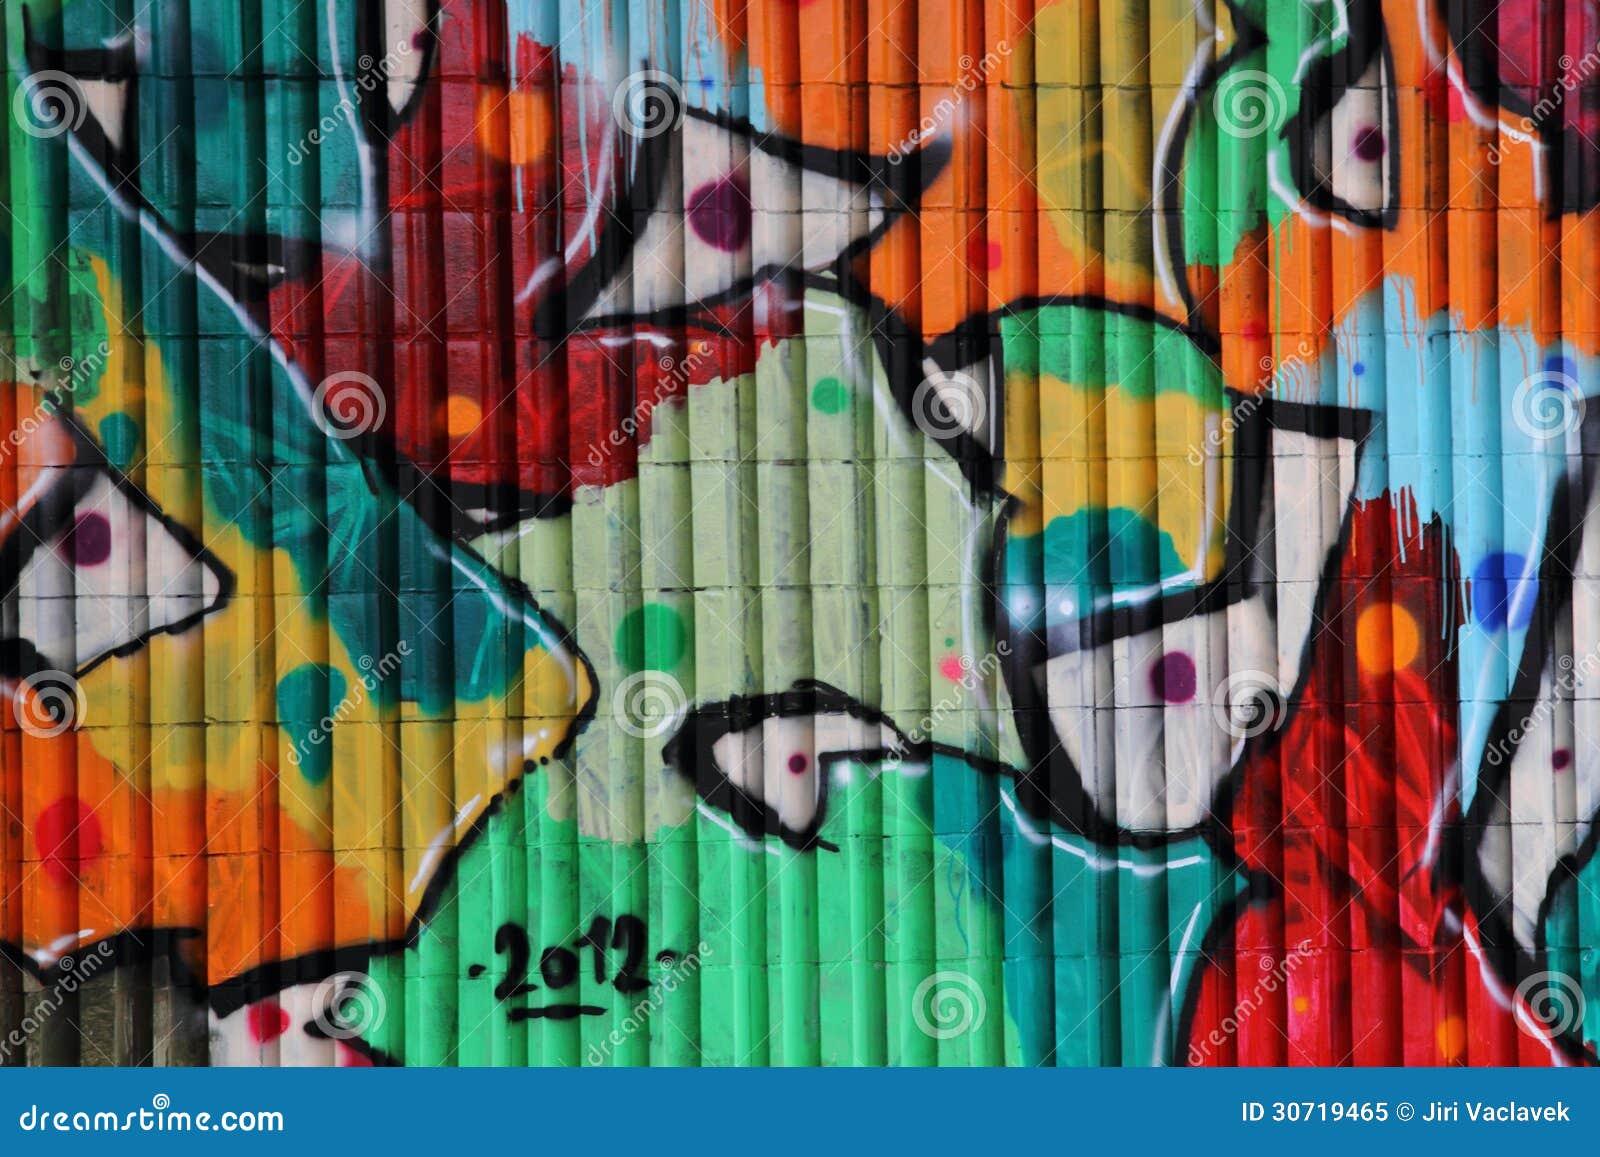 Graffiti art background - Art Background Color Graffiti